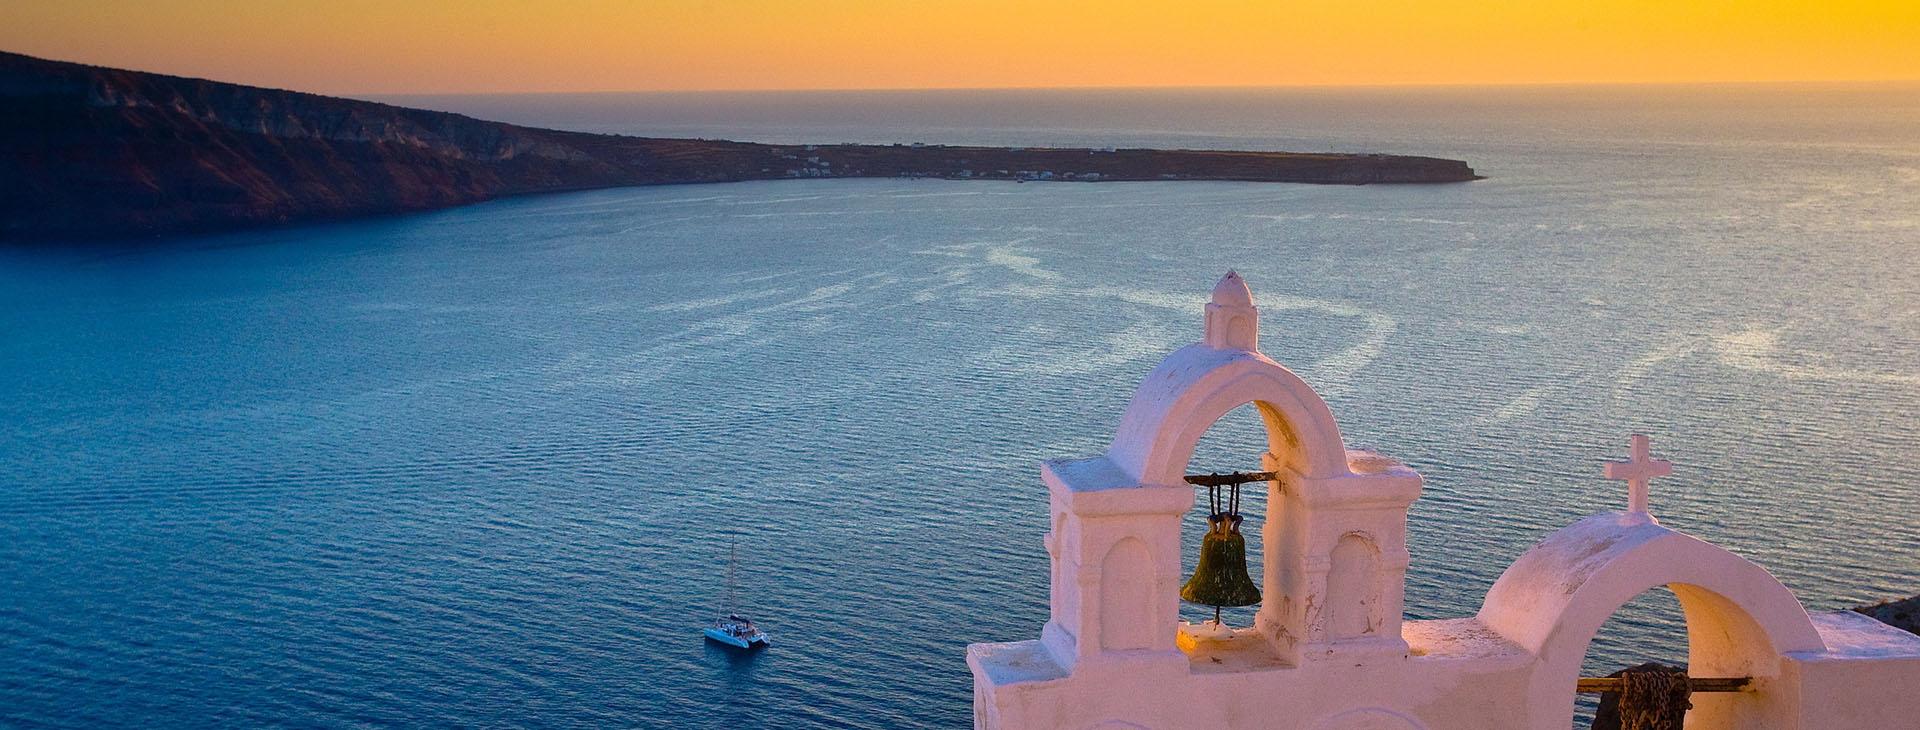 Sunset at Santorini island